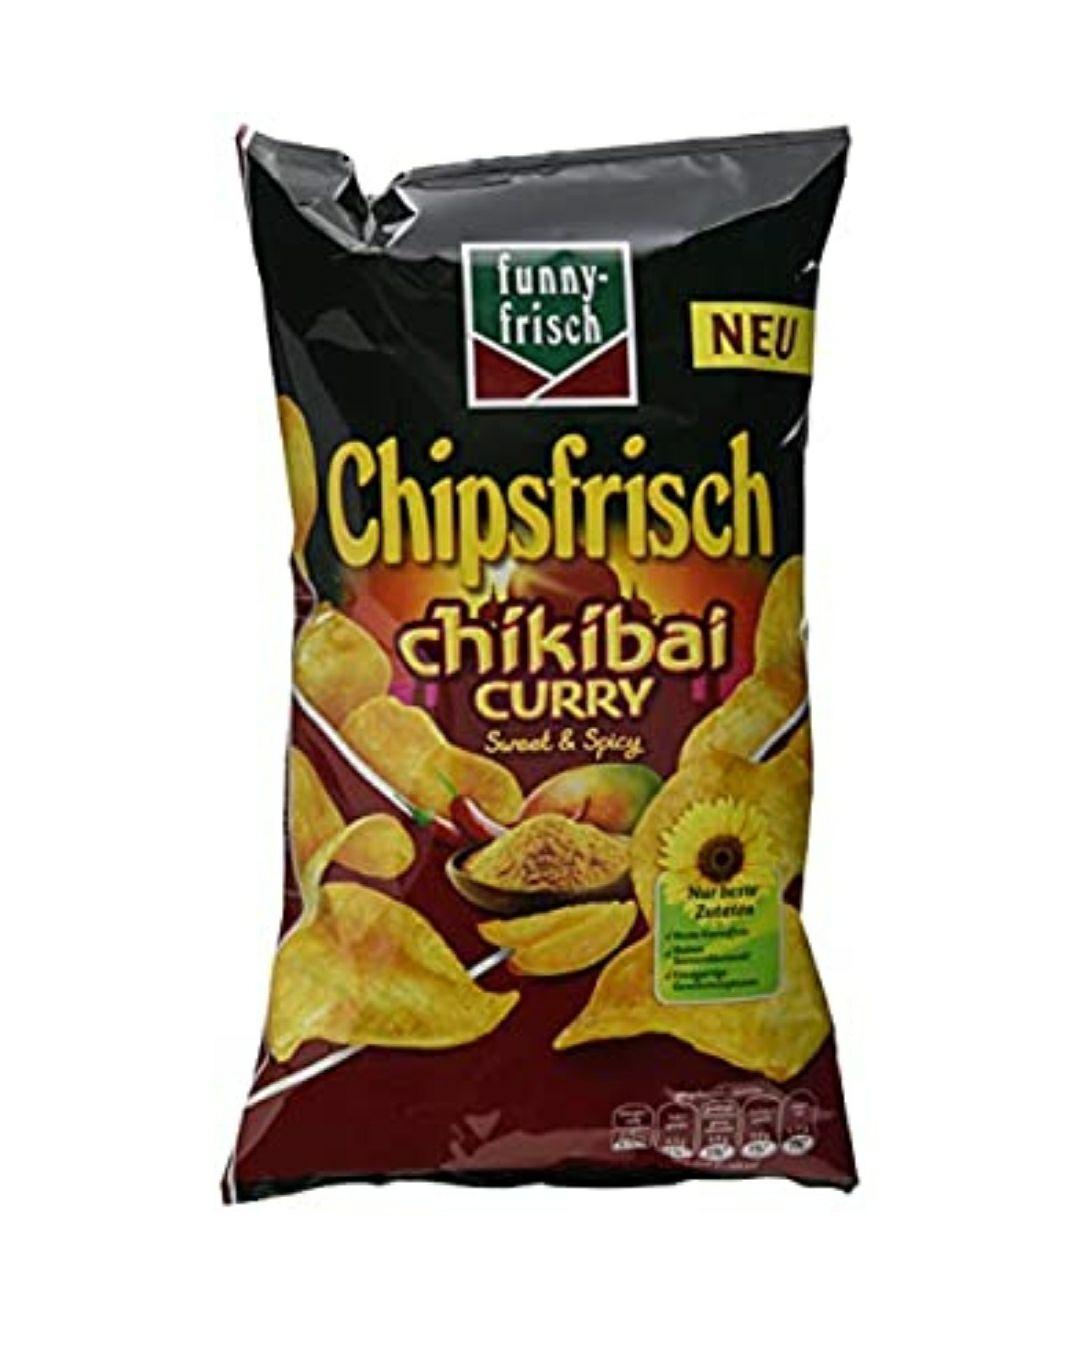 Chipsfrisch Chikibai Curry (10er Pack)